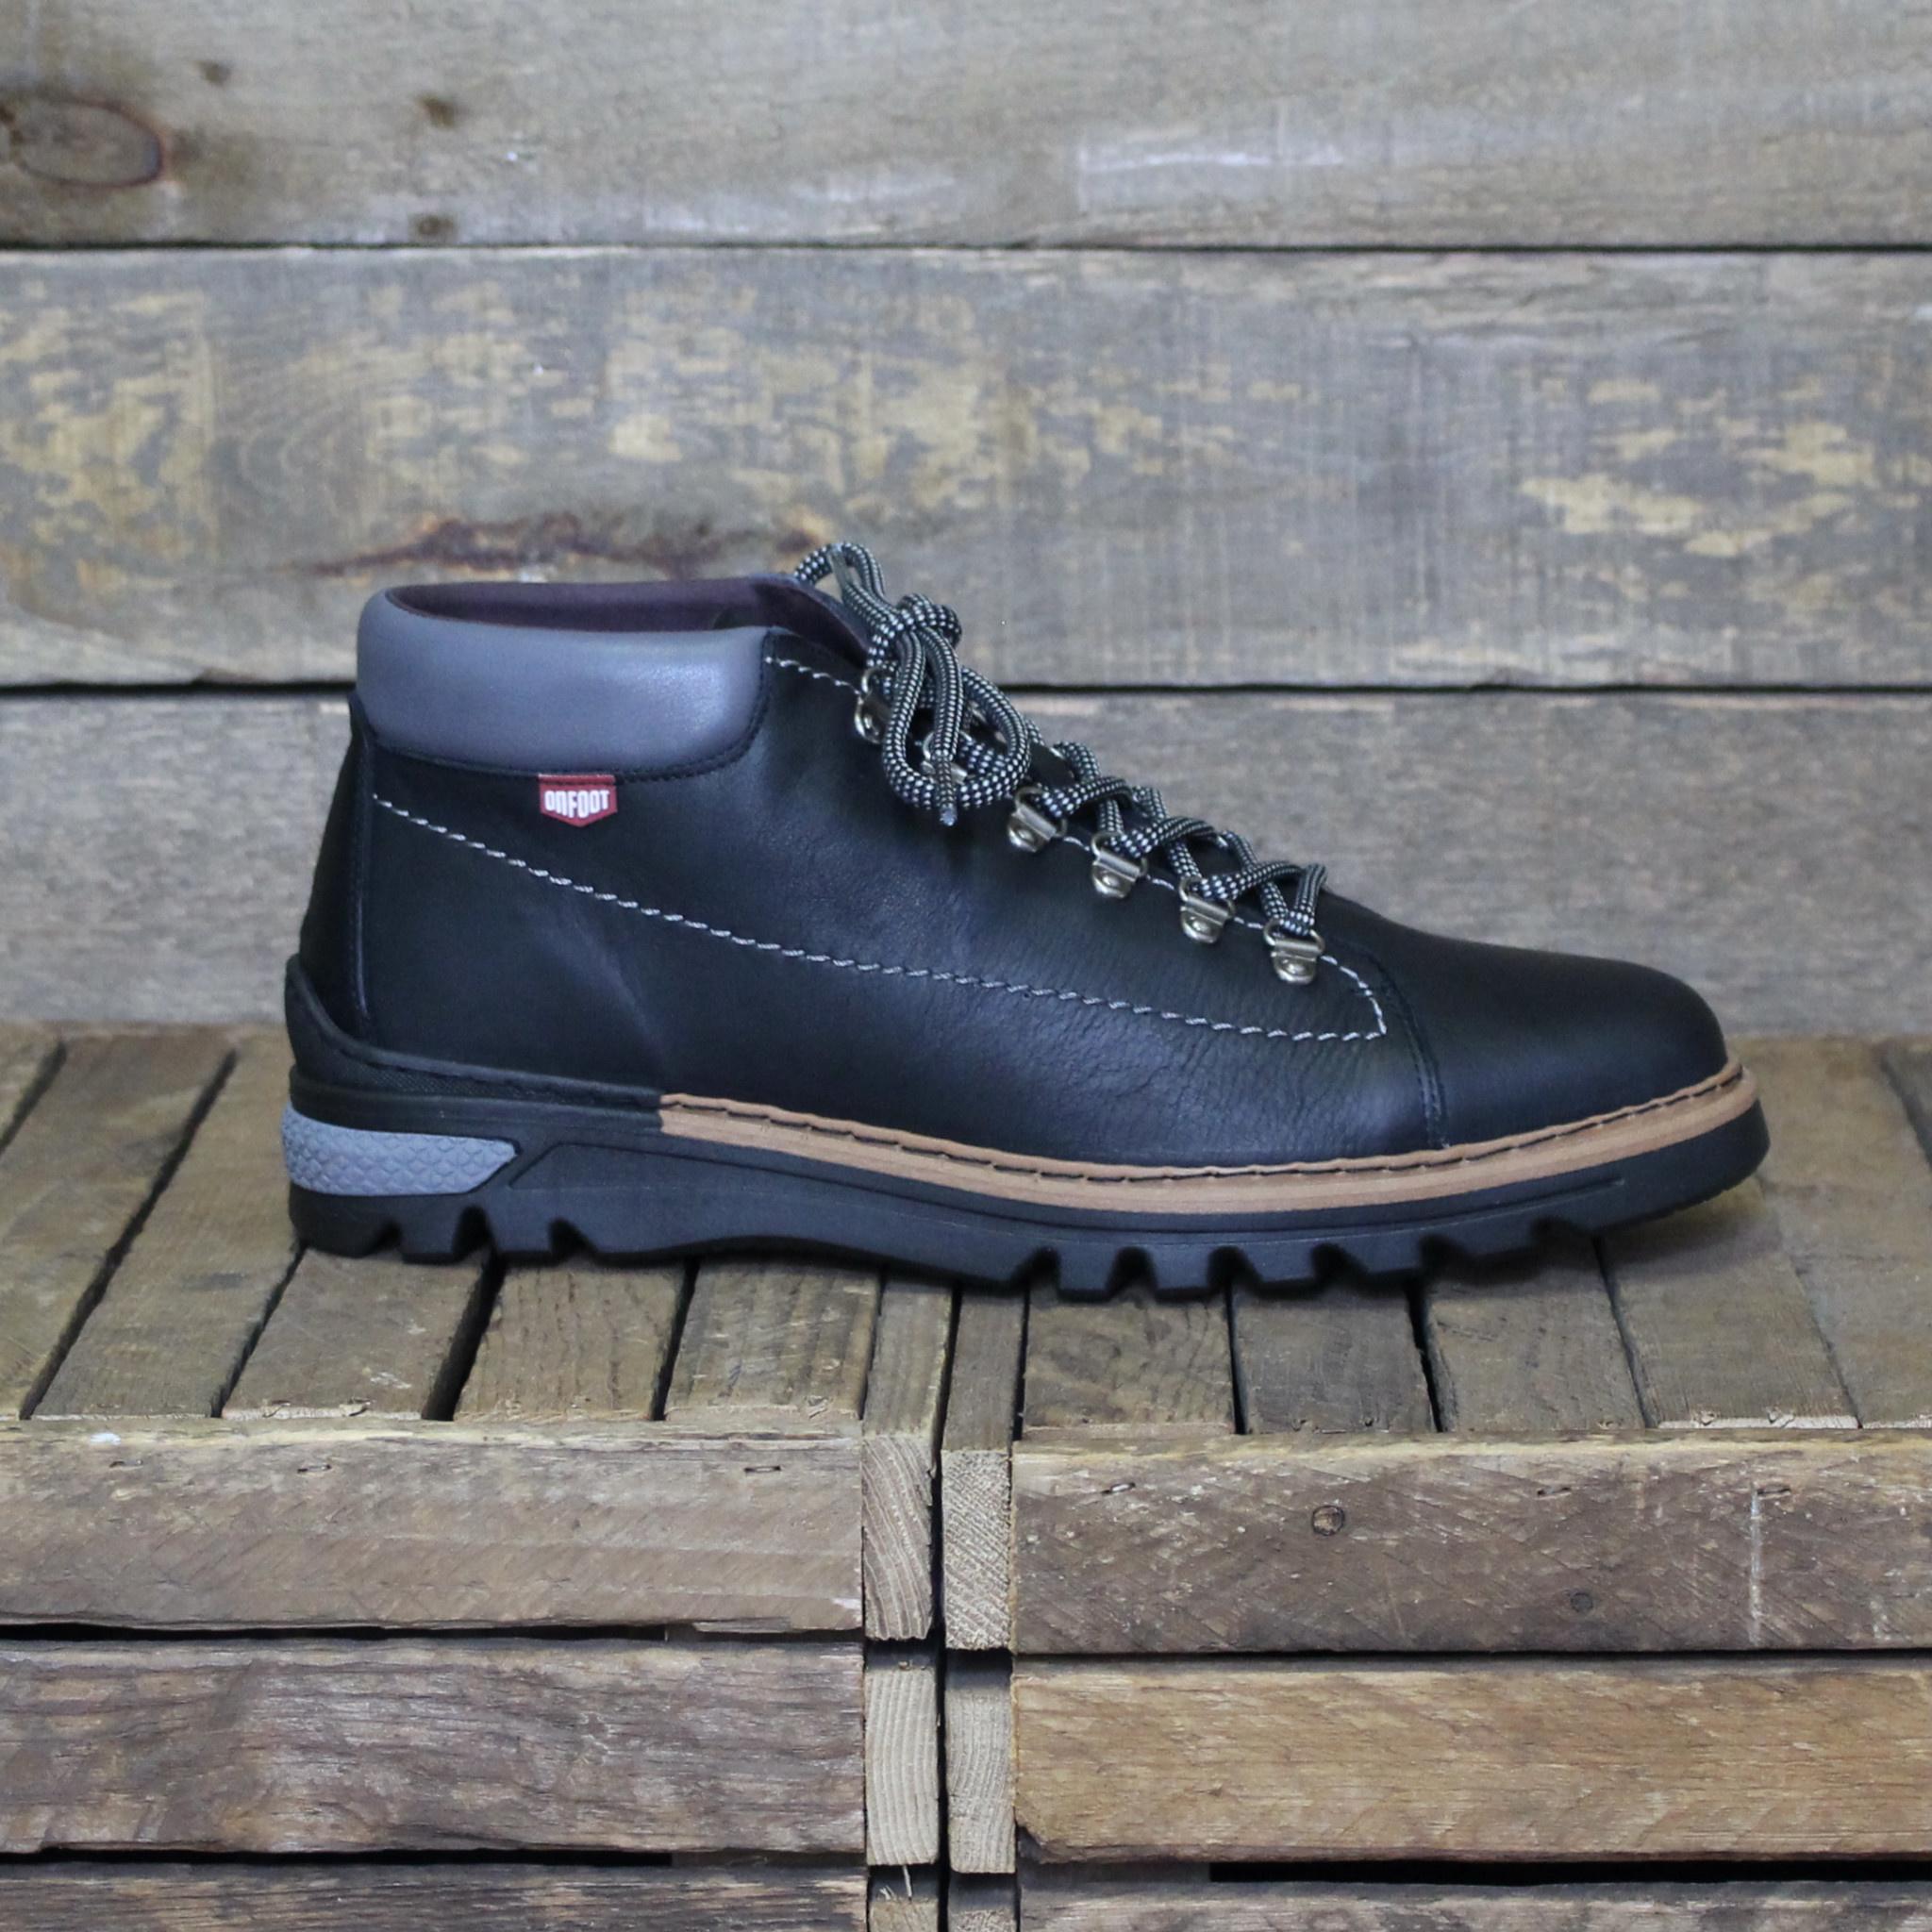 On Foot On Foot - 10104 Men shoes - Black